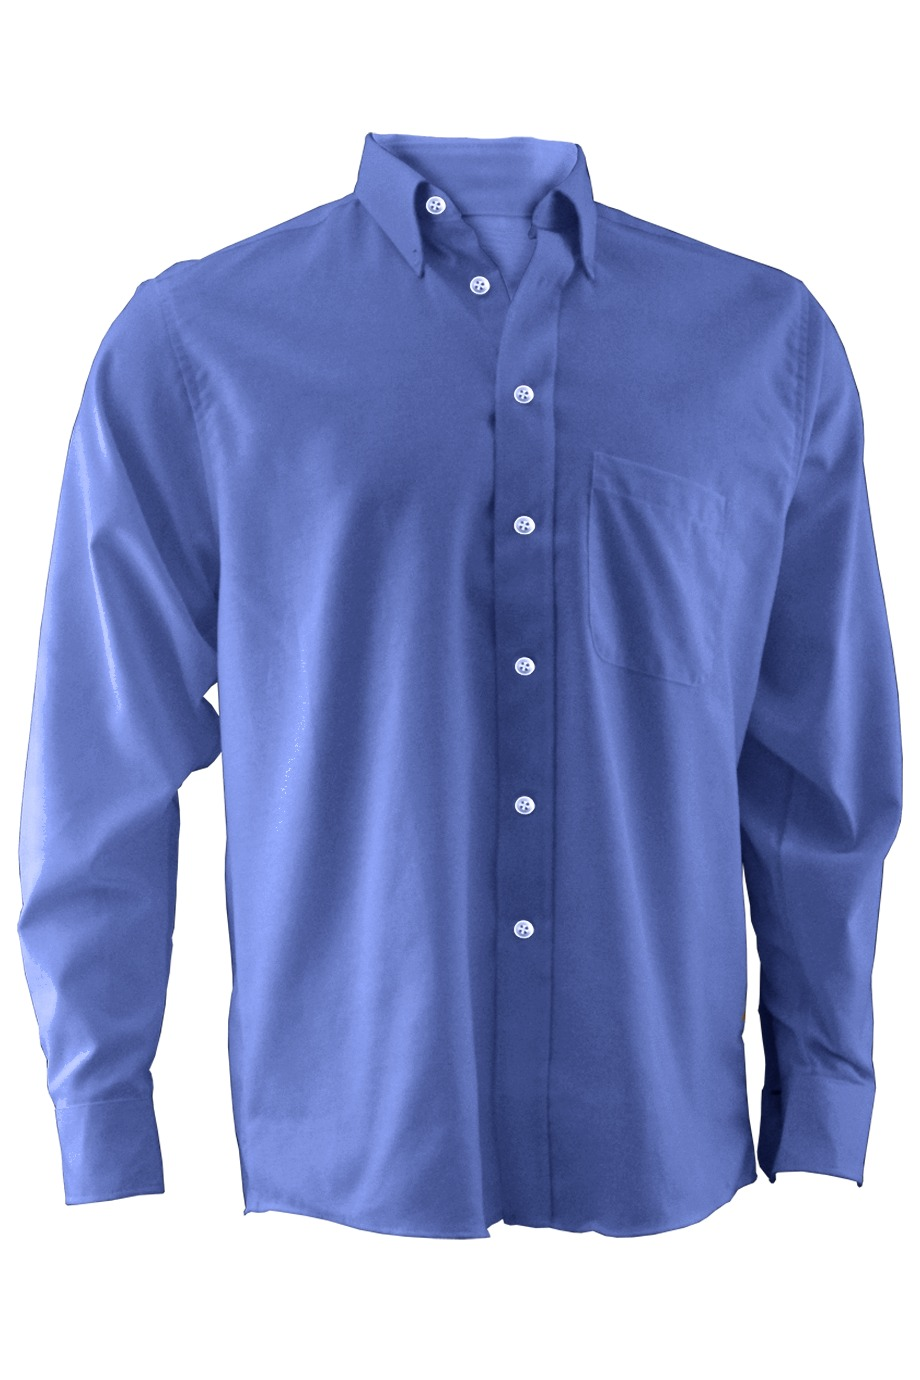 Edwards Garment 1077 - Men's Easy Care Long Sleeve Oxford